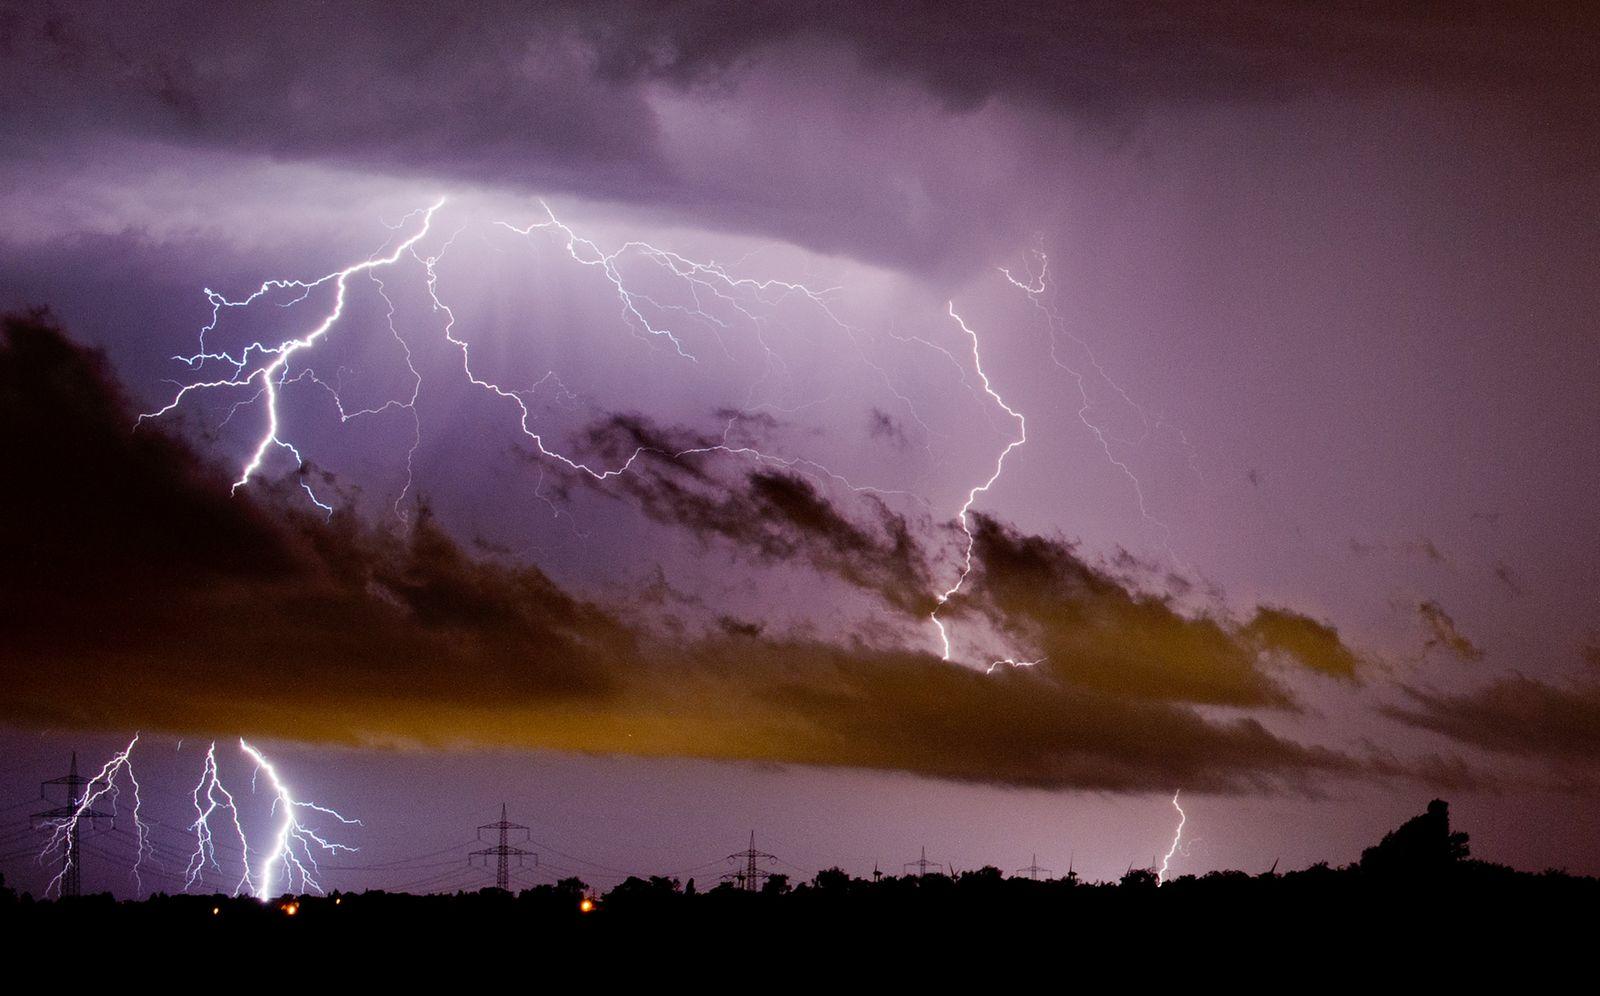 SPERRFRIST 13.11.14 20Uhr Blitze/ Klimawandel